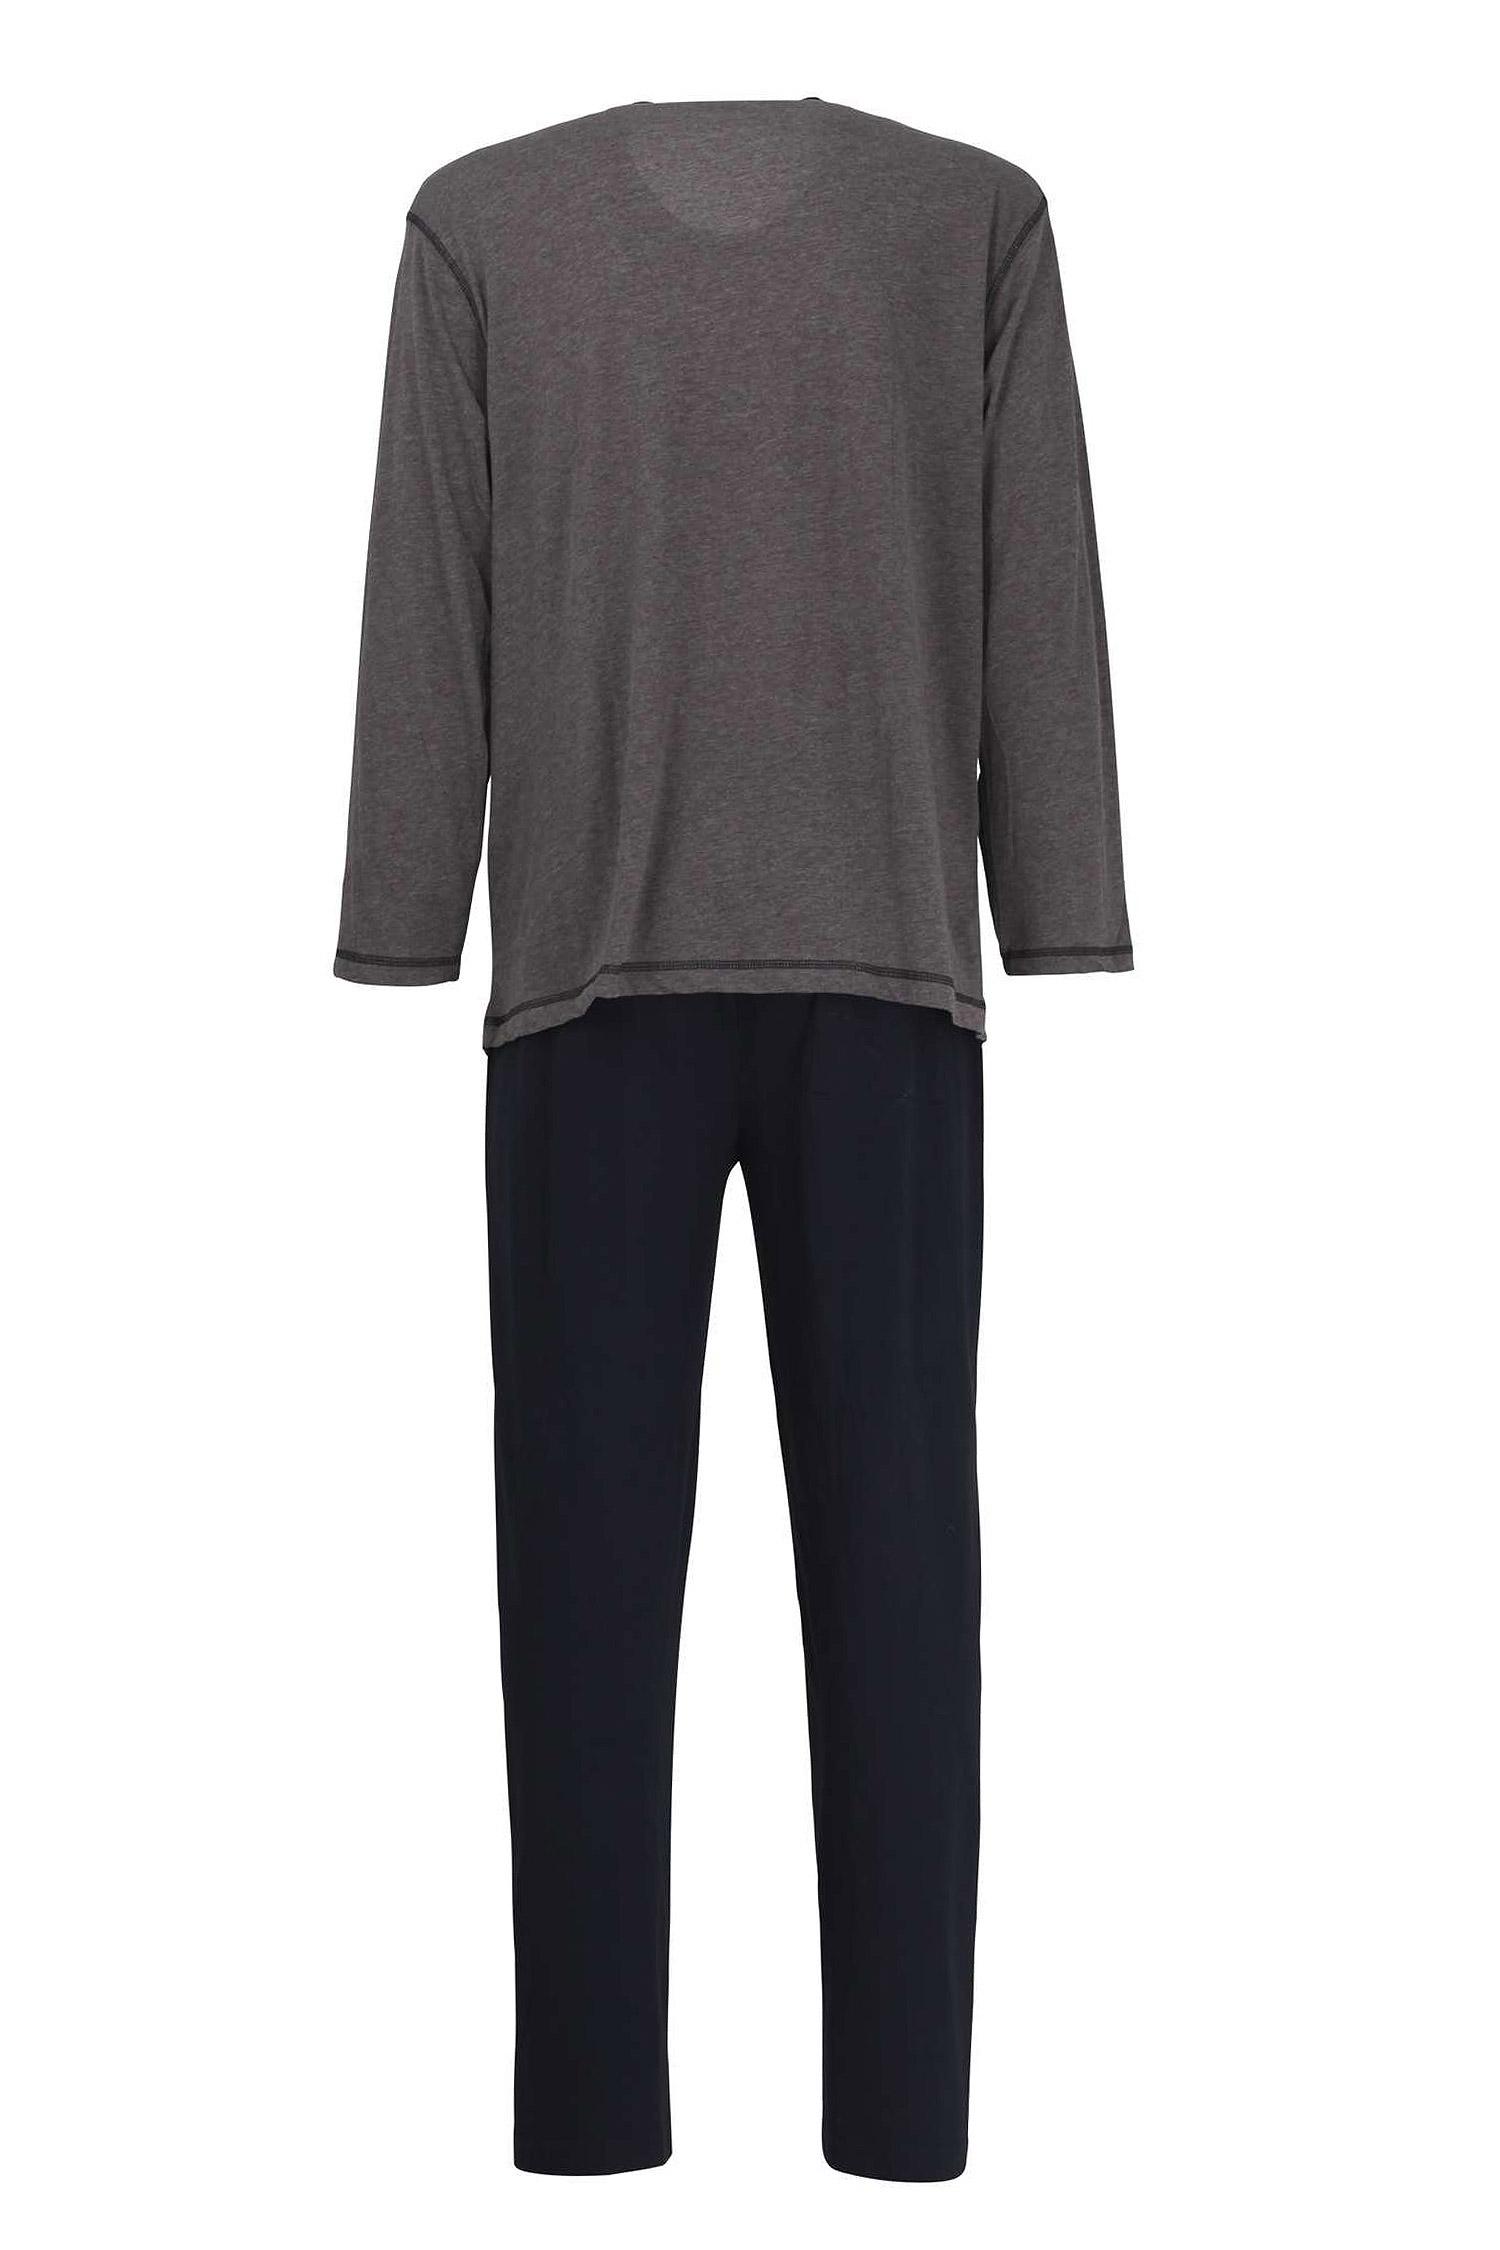 Homewear, Pijama M. Larga, 110578, GRIS MEDIO | Zoom